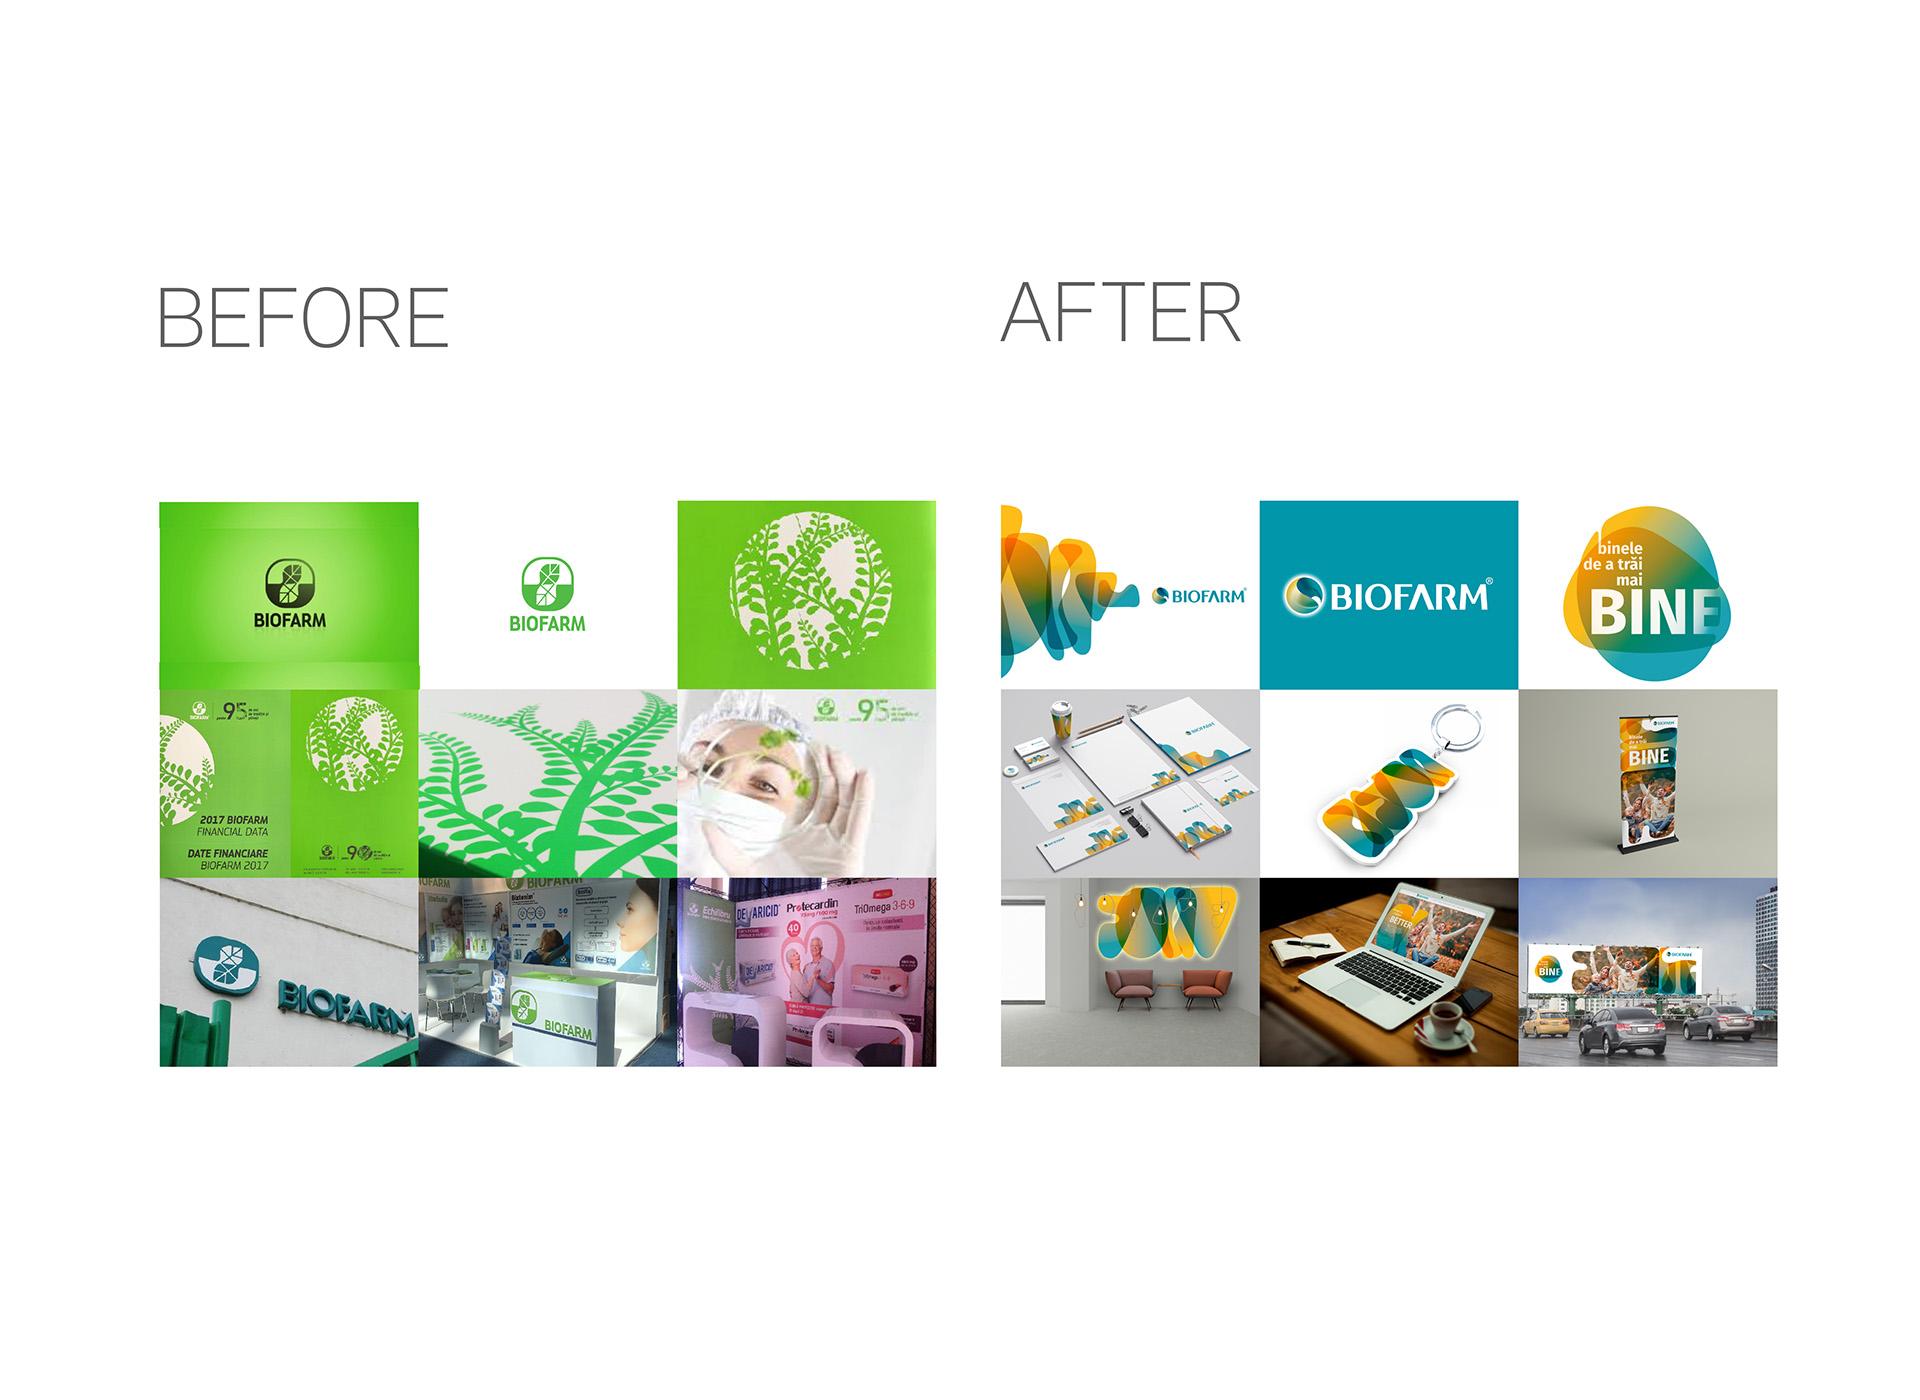 Biofarm portofoliu inoveo before and after